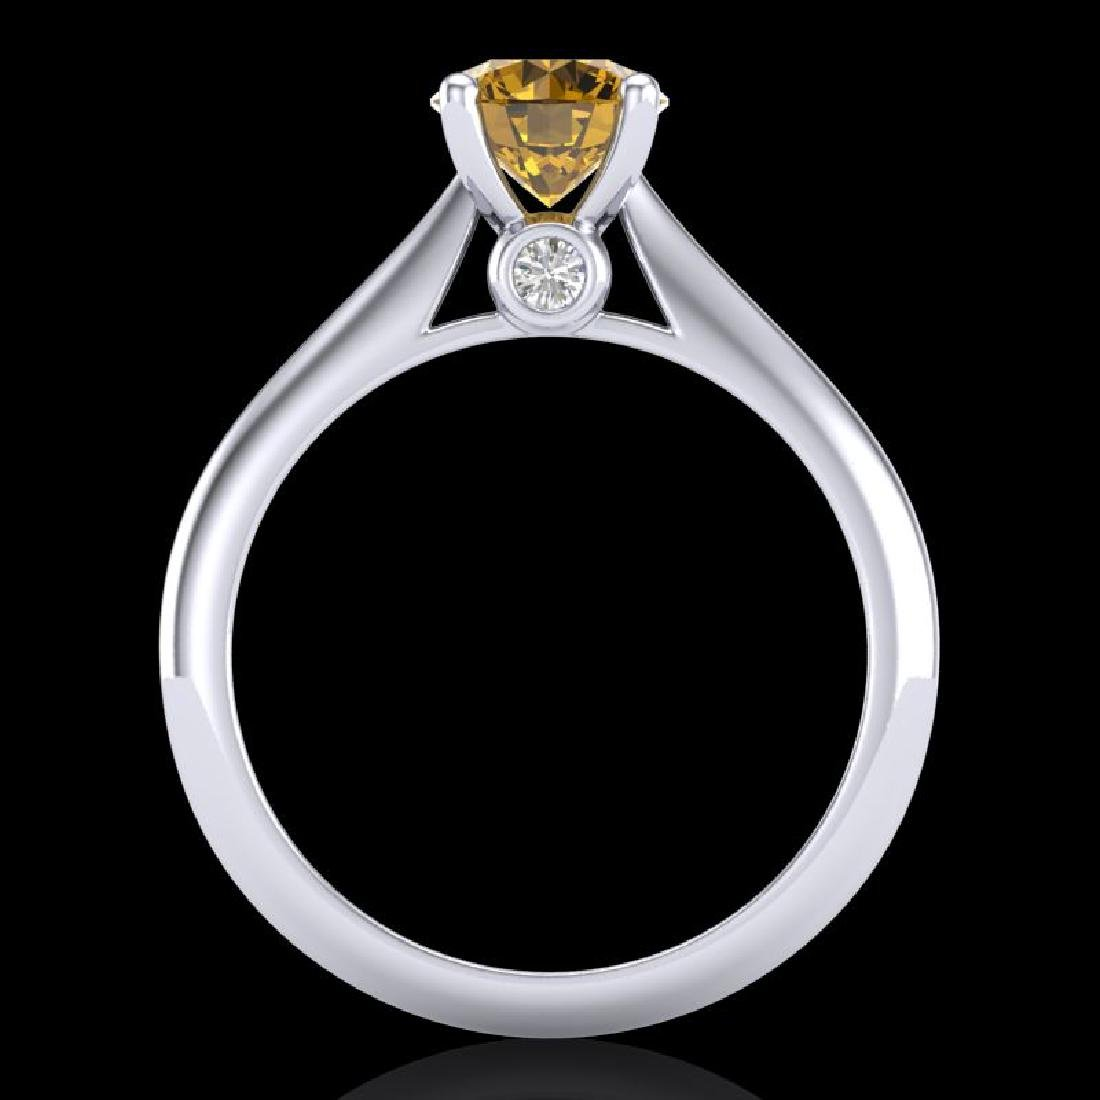 1.08 CTW Intense Fancy Yellow Diamond Engagement Art - 3